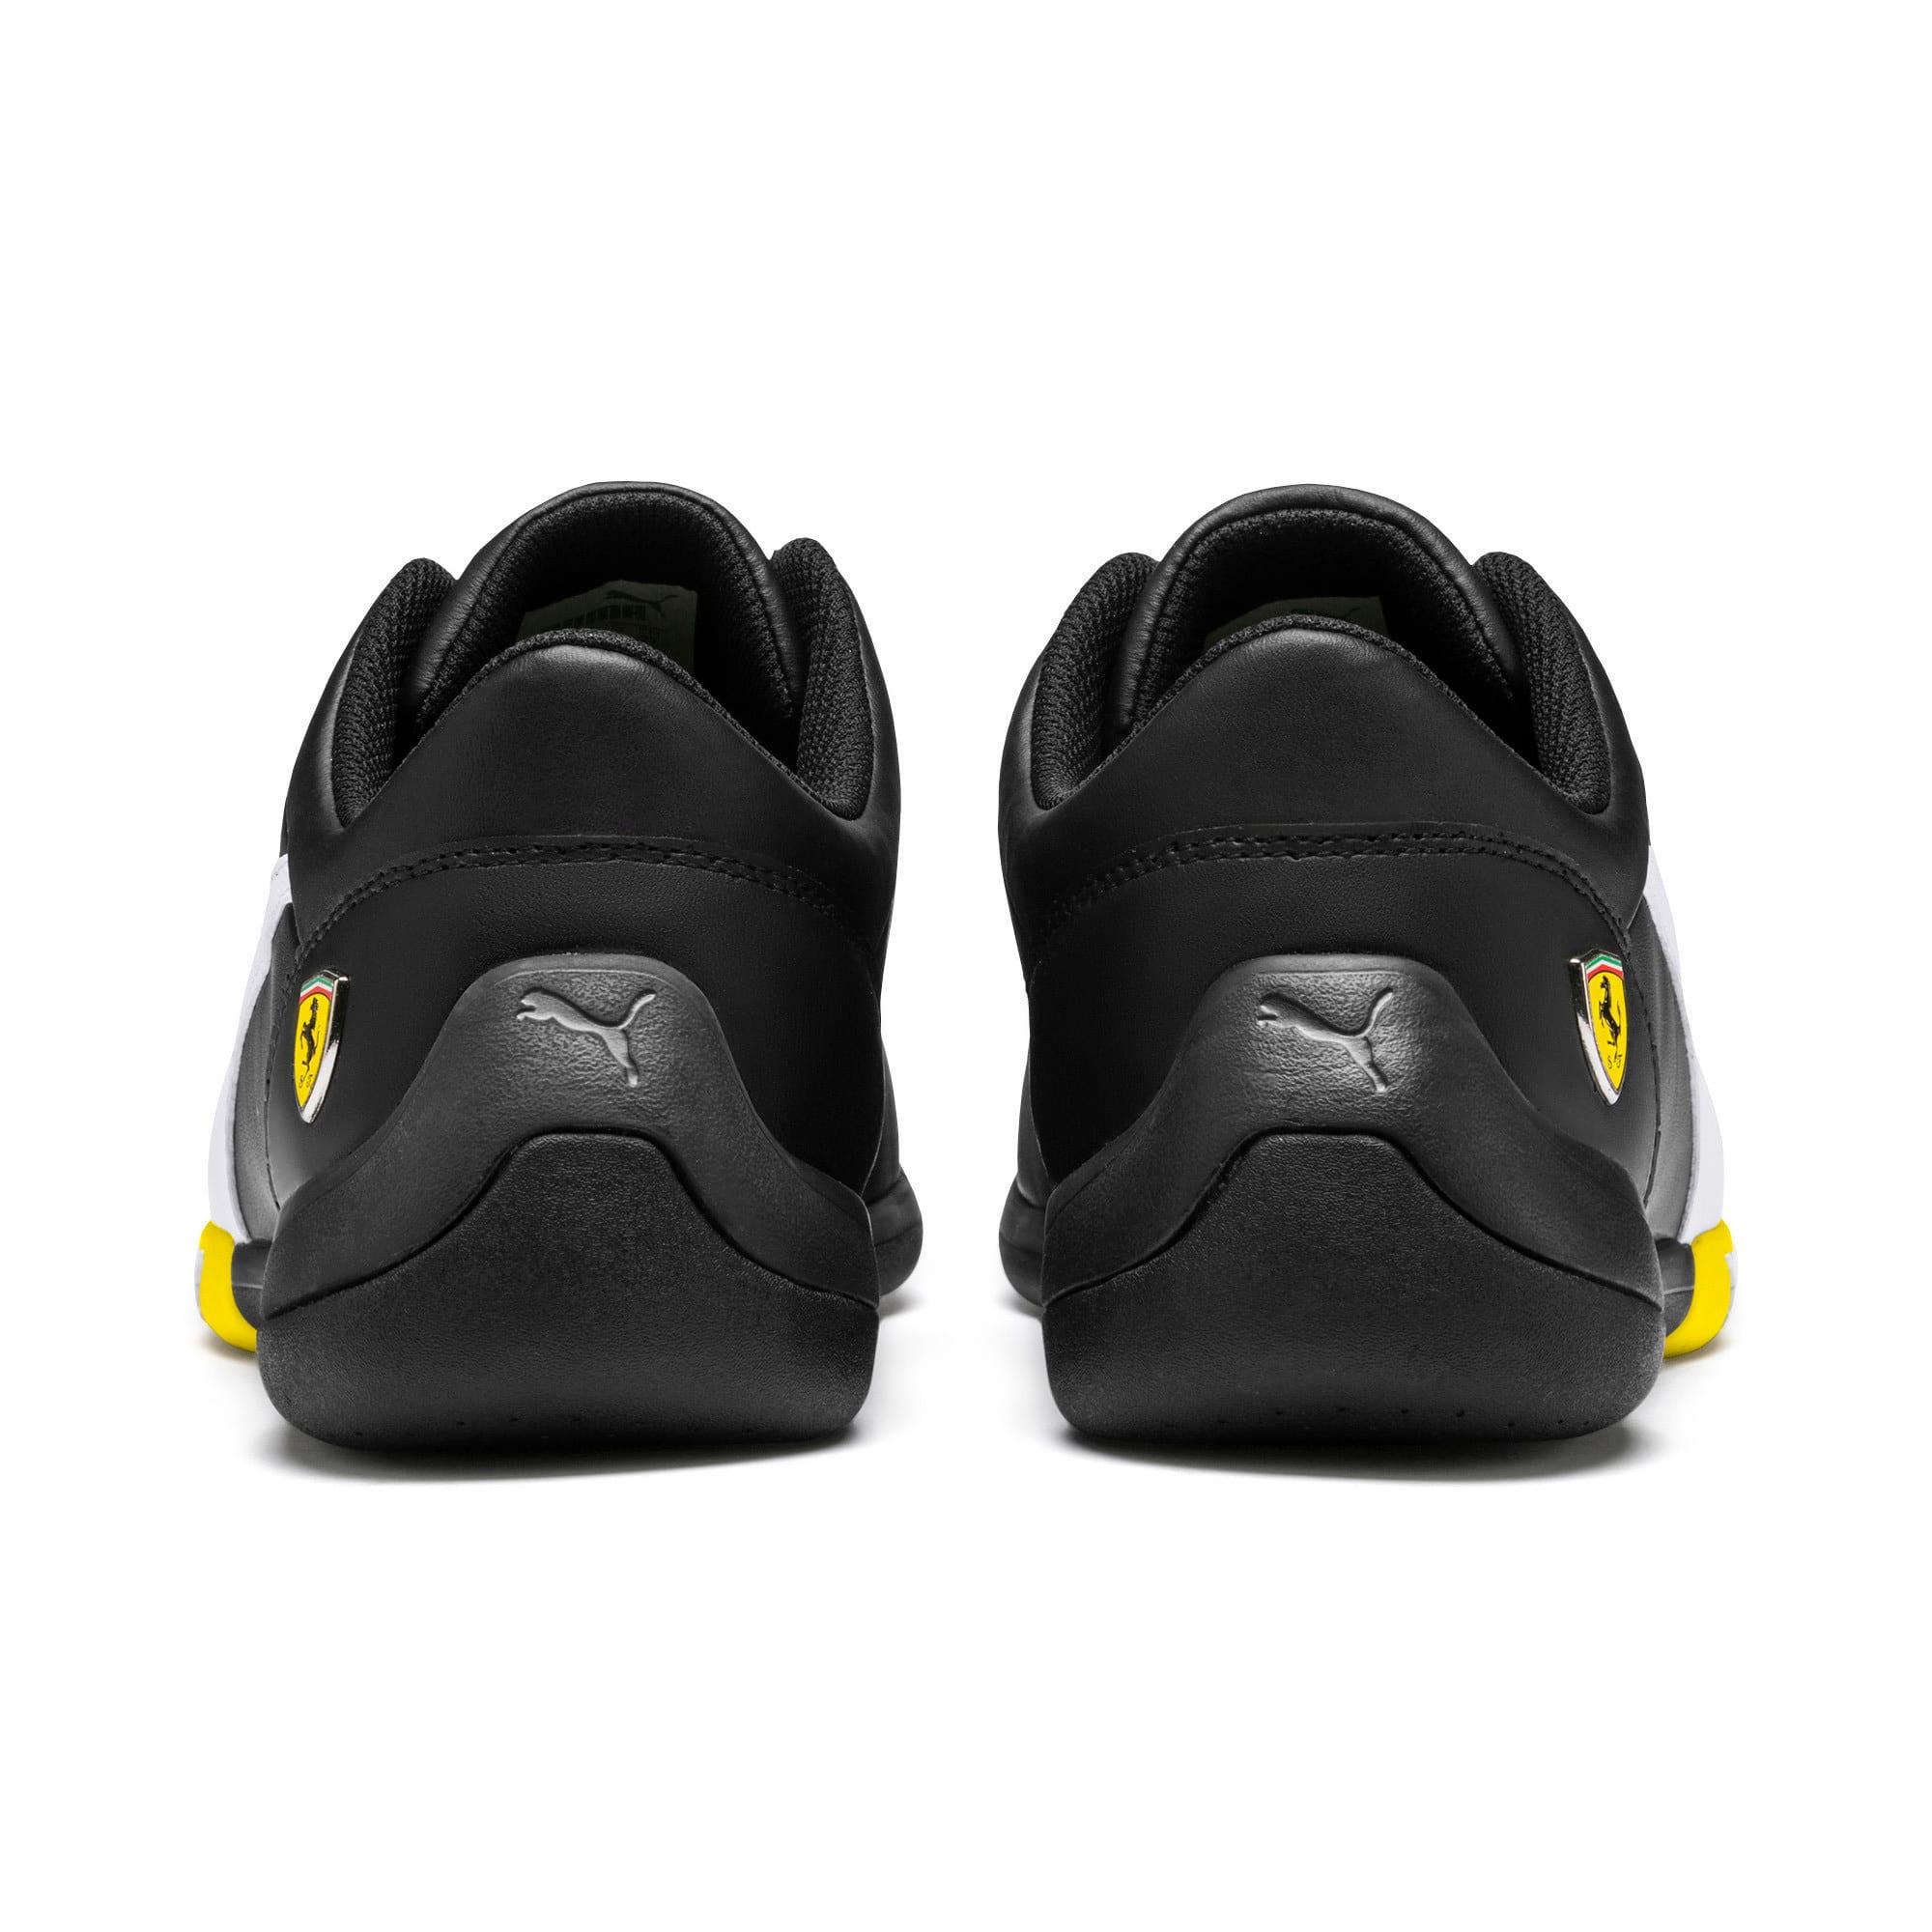 Thumbnail 4 of Scuderia Ferrari Kart Cat III Shoes, Black-White-Blazing Yellow, medium